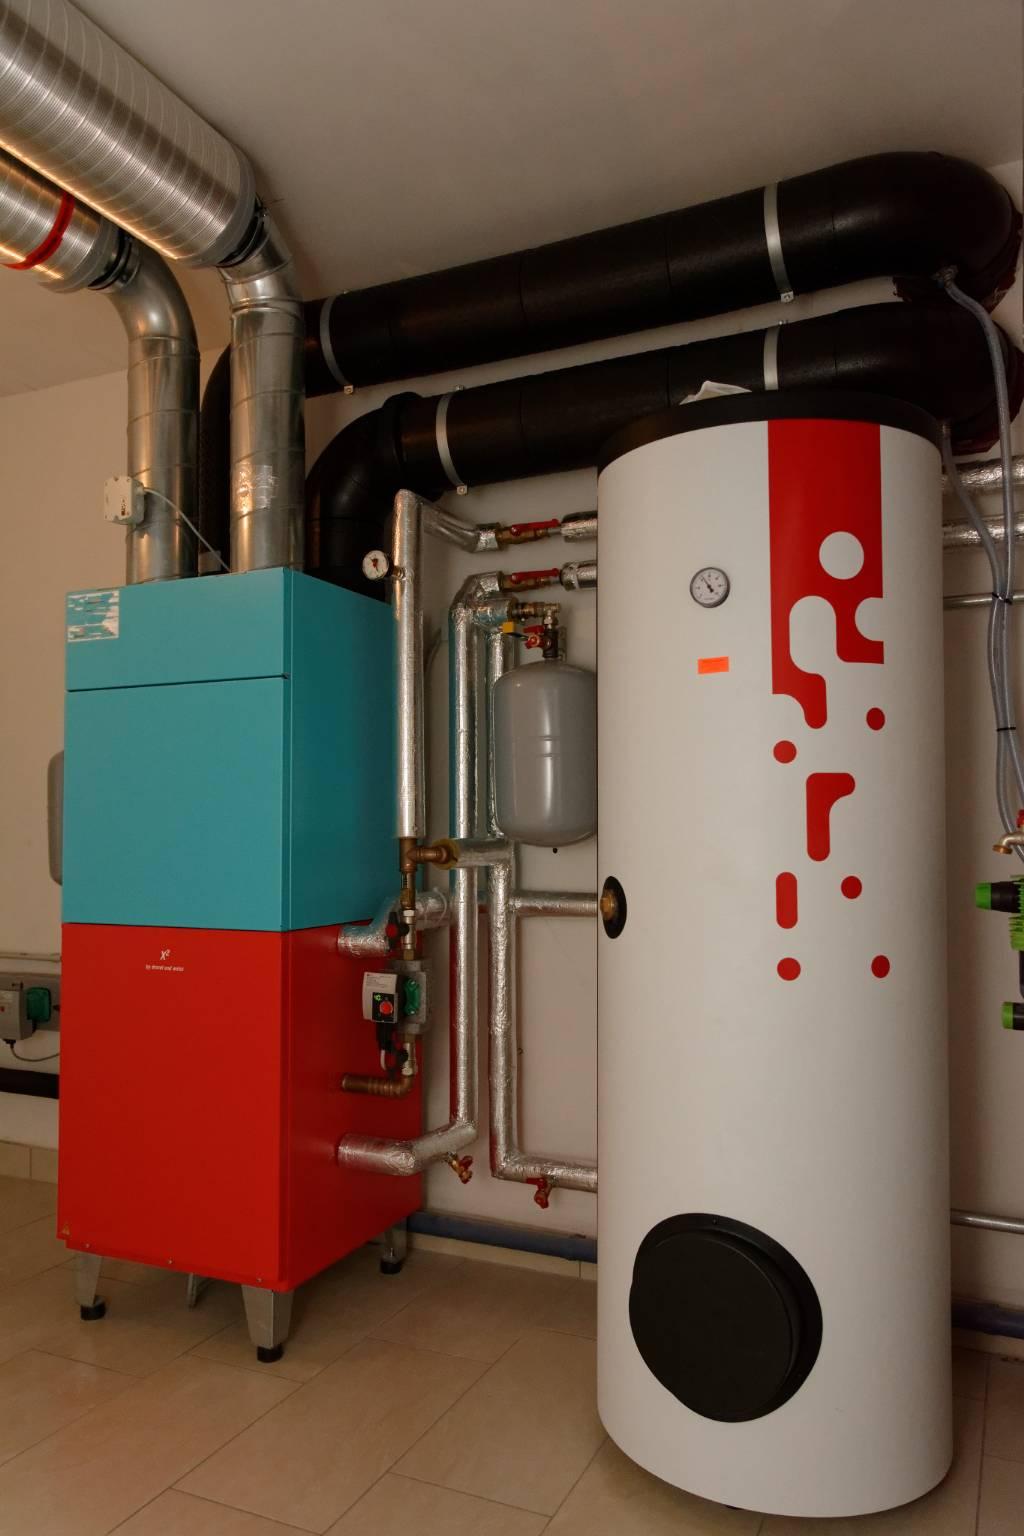 http://www.energiesparhaus.at/bilderupload2016/20160112629268.JPG